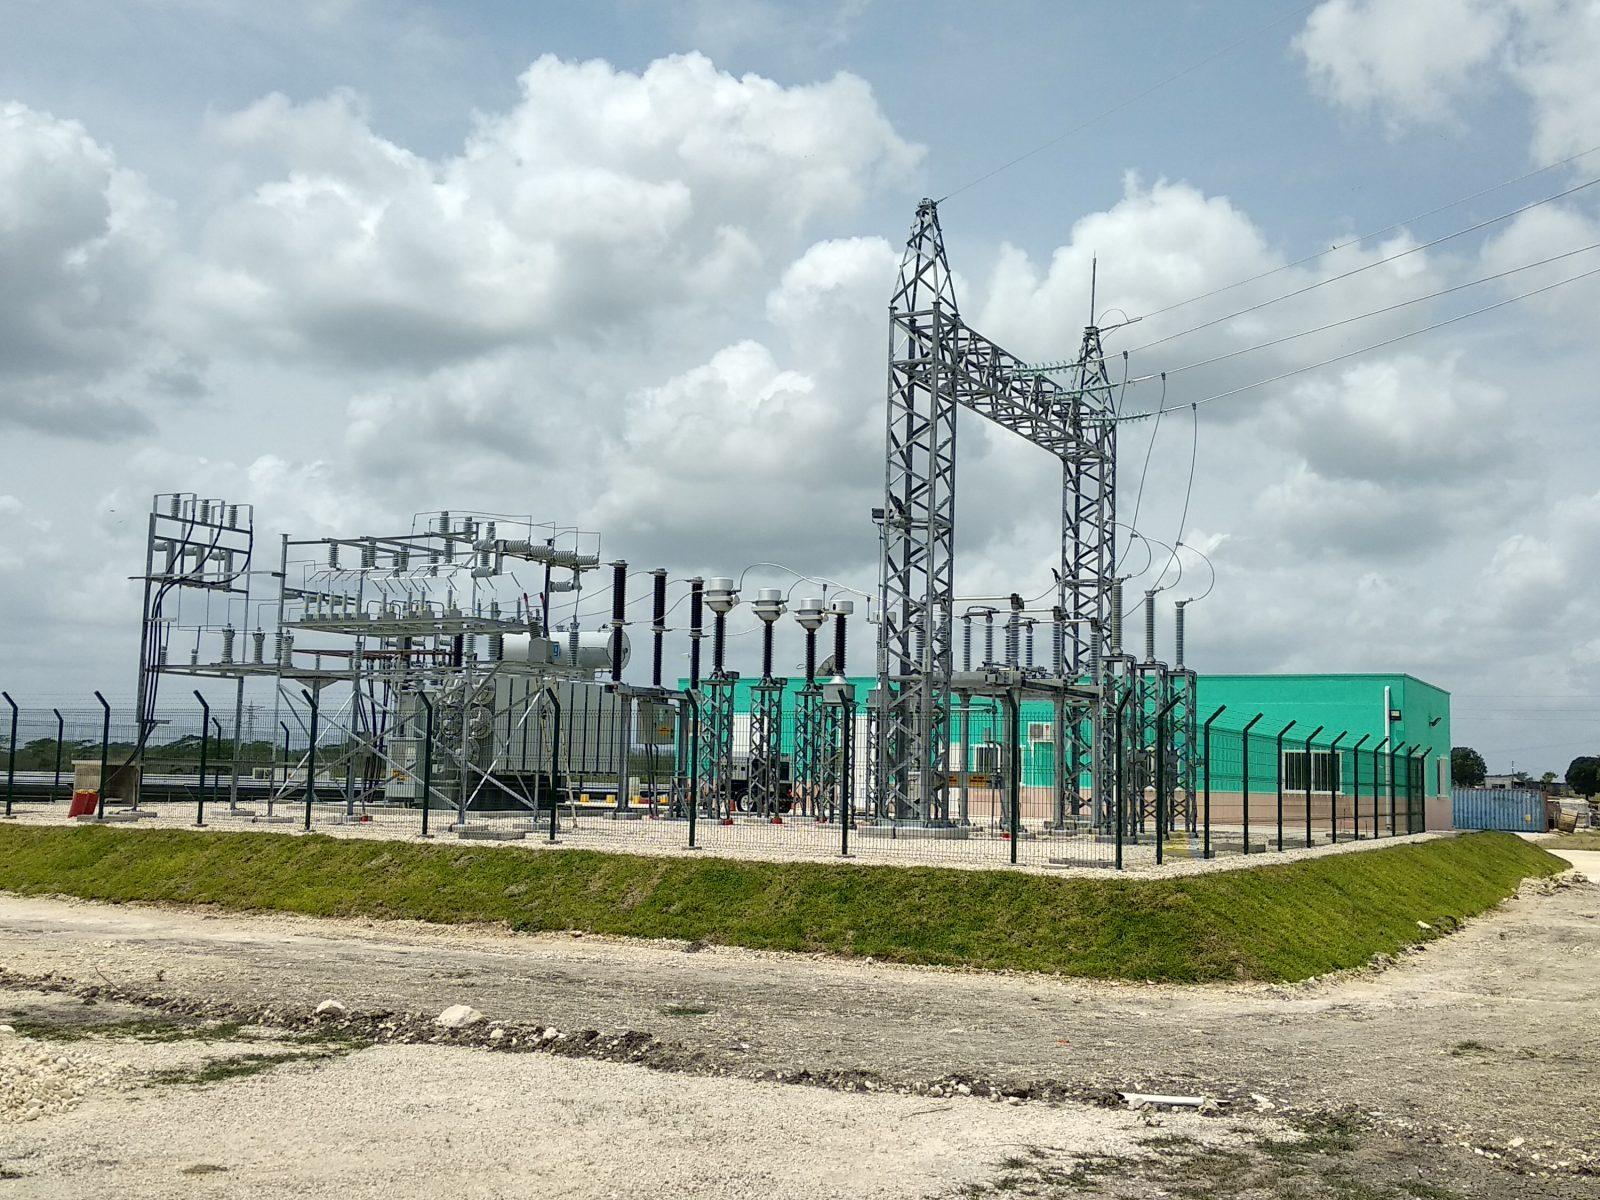 Photovoltaic solar plant maintenance: 36 MWp (Mexico)